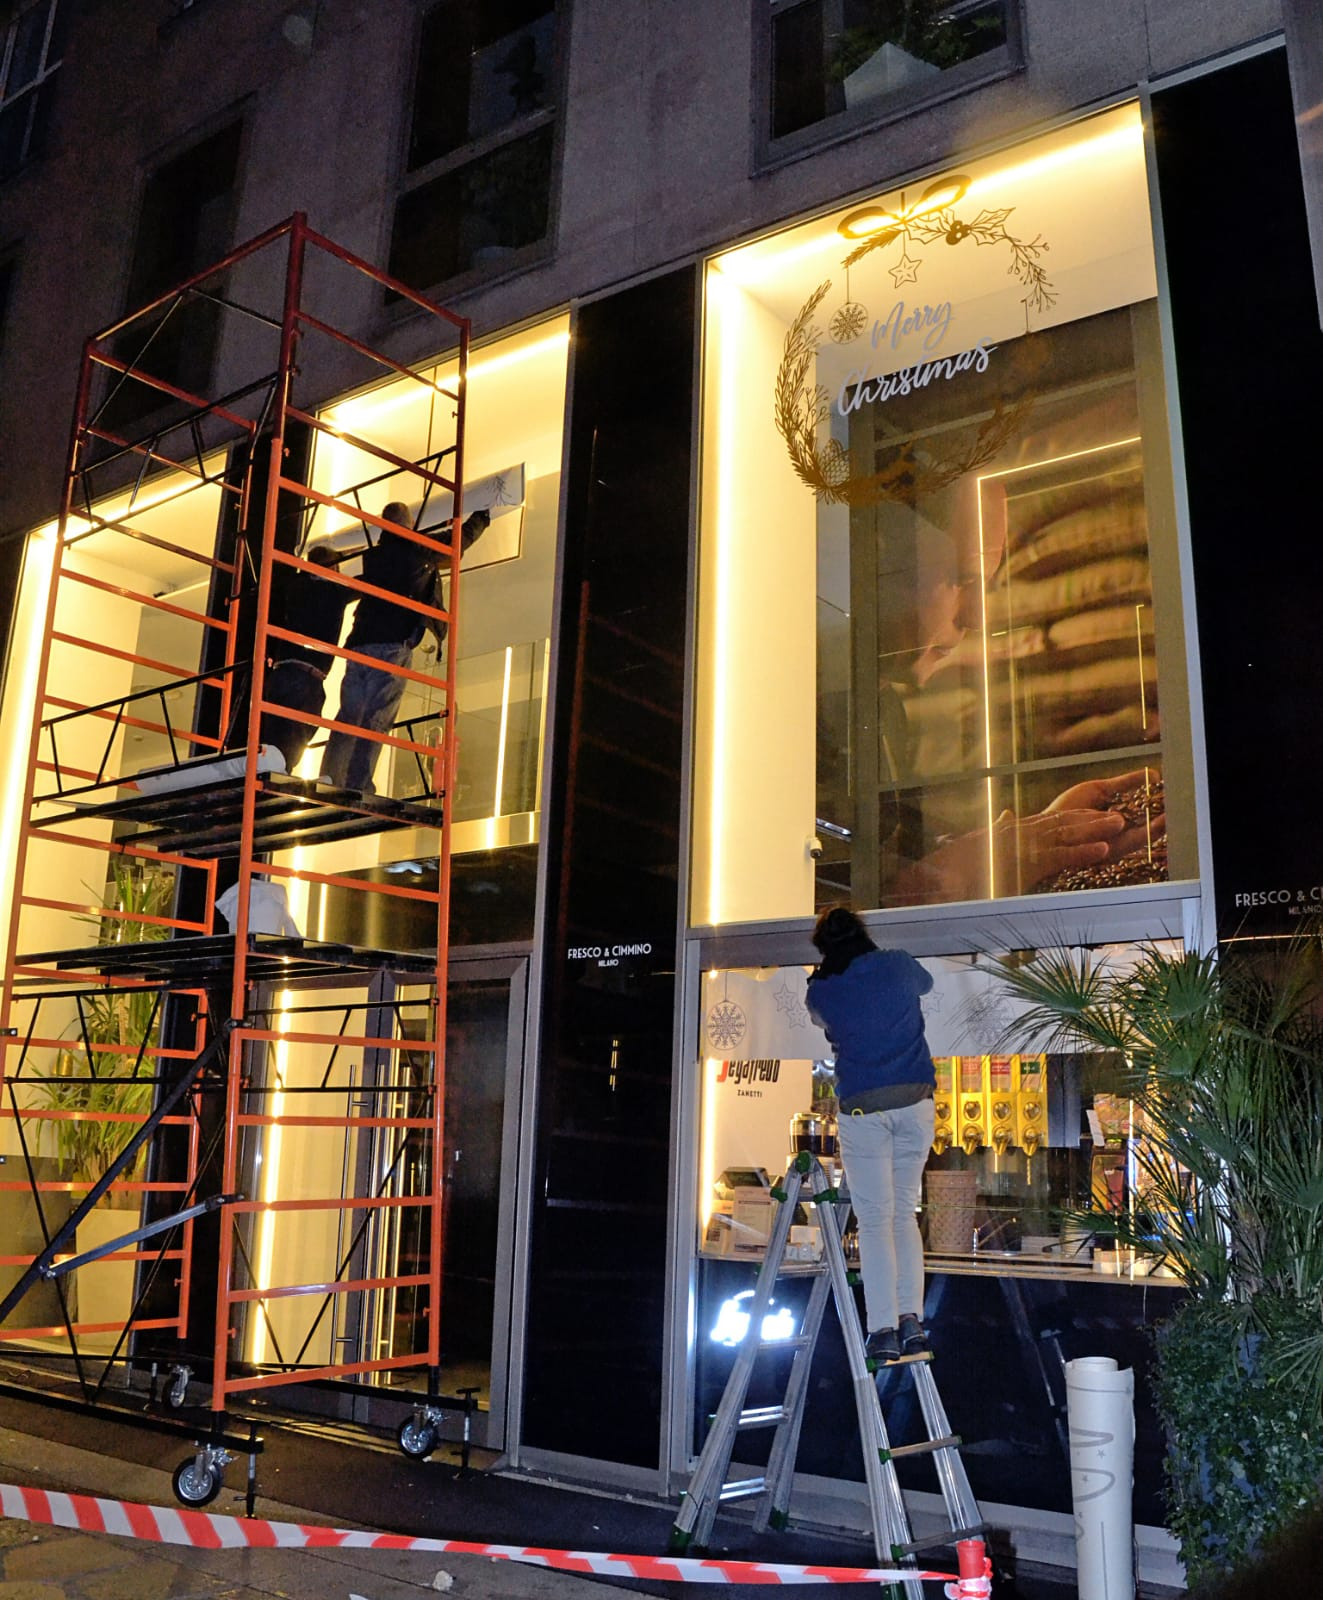 Perché Vetrofanie Milano